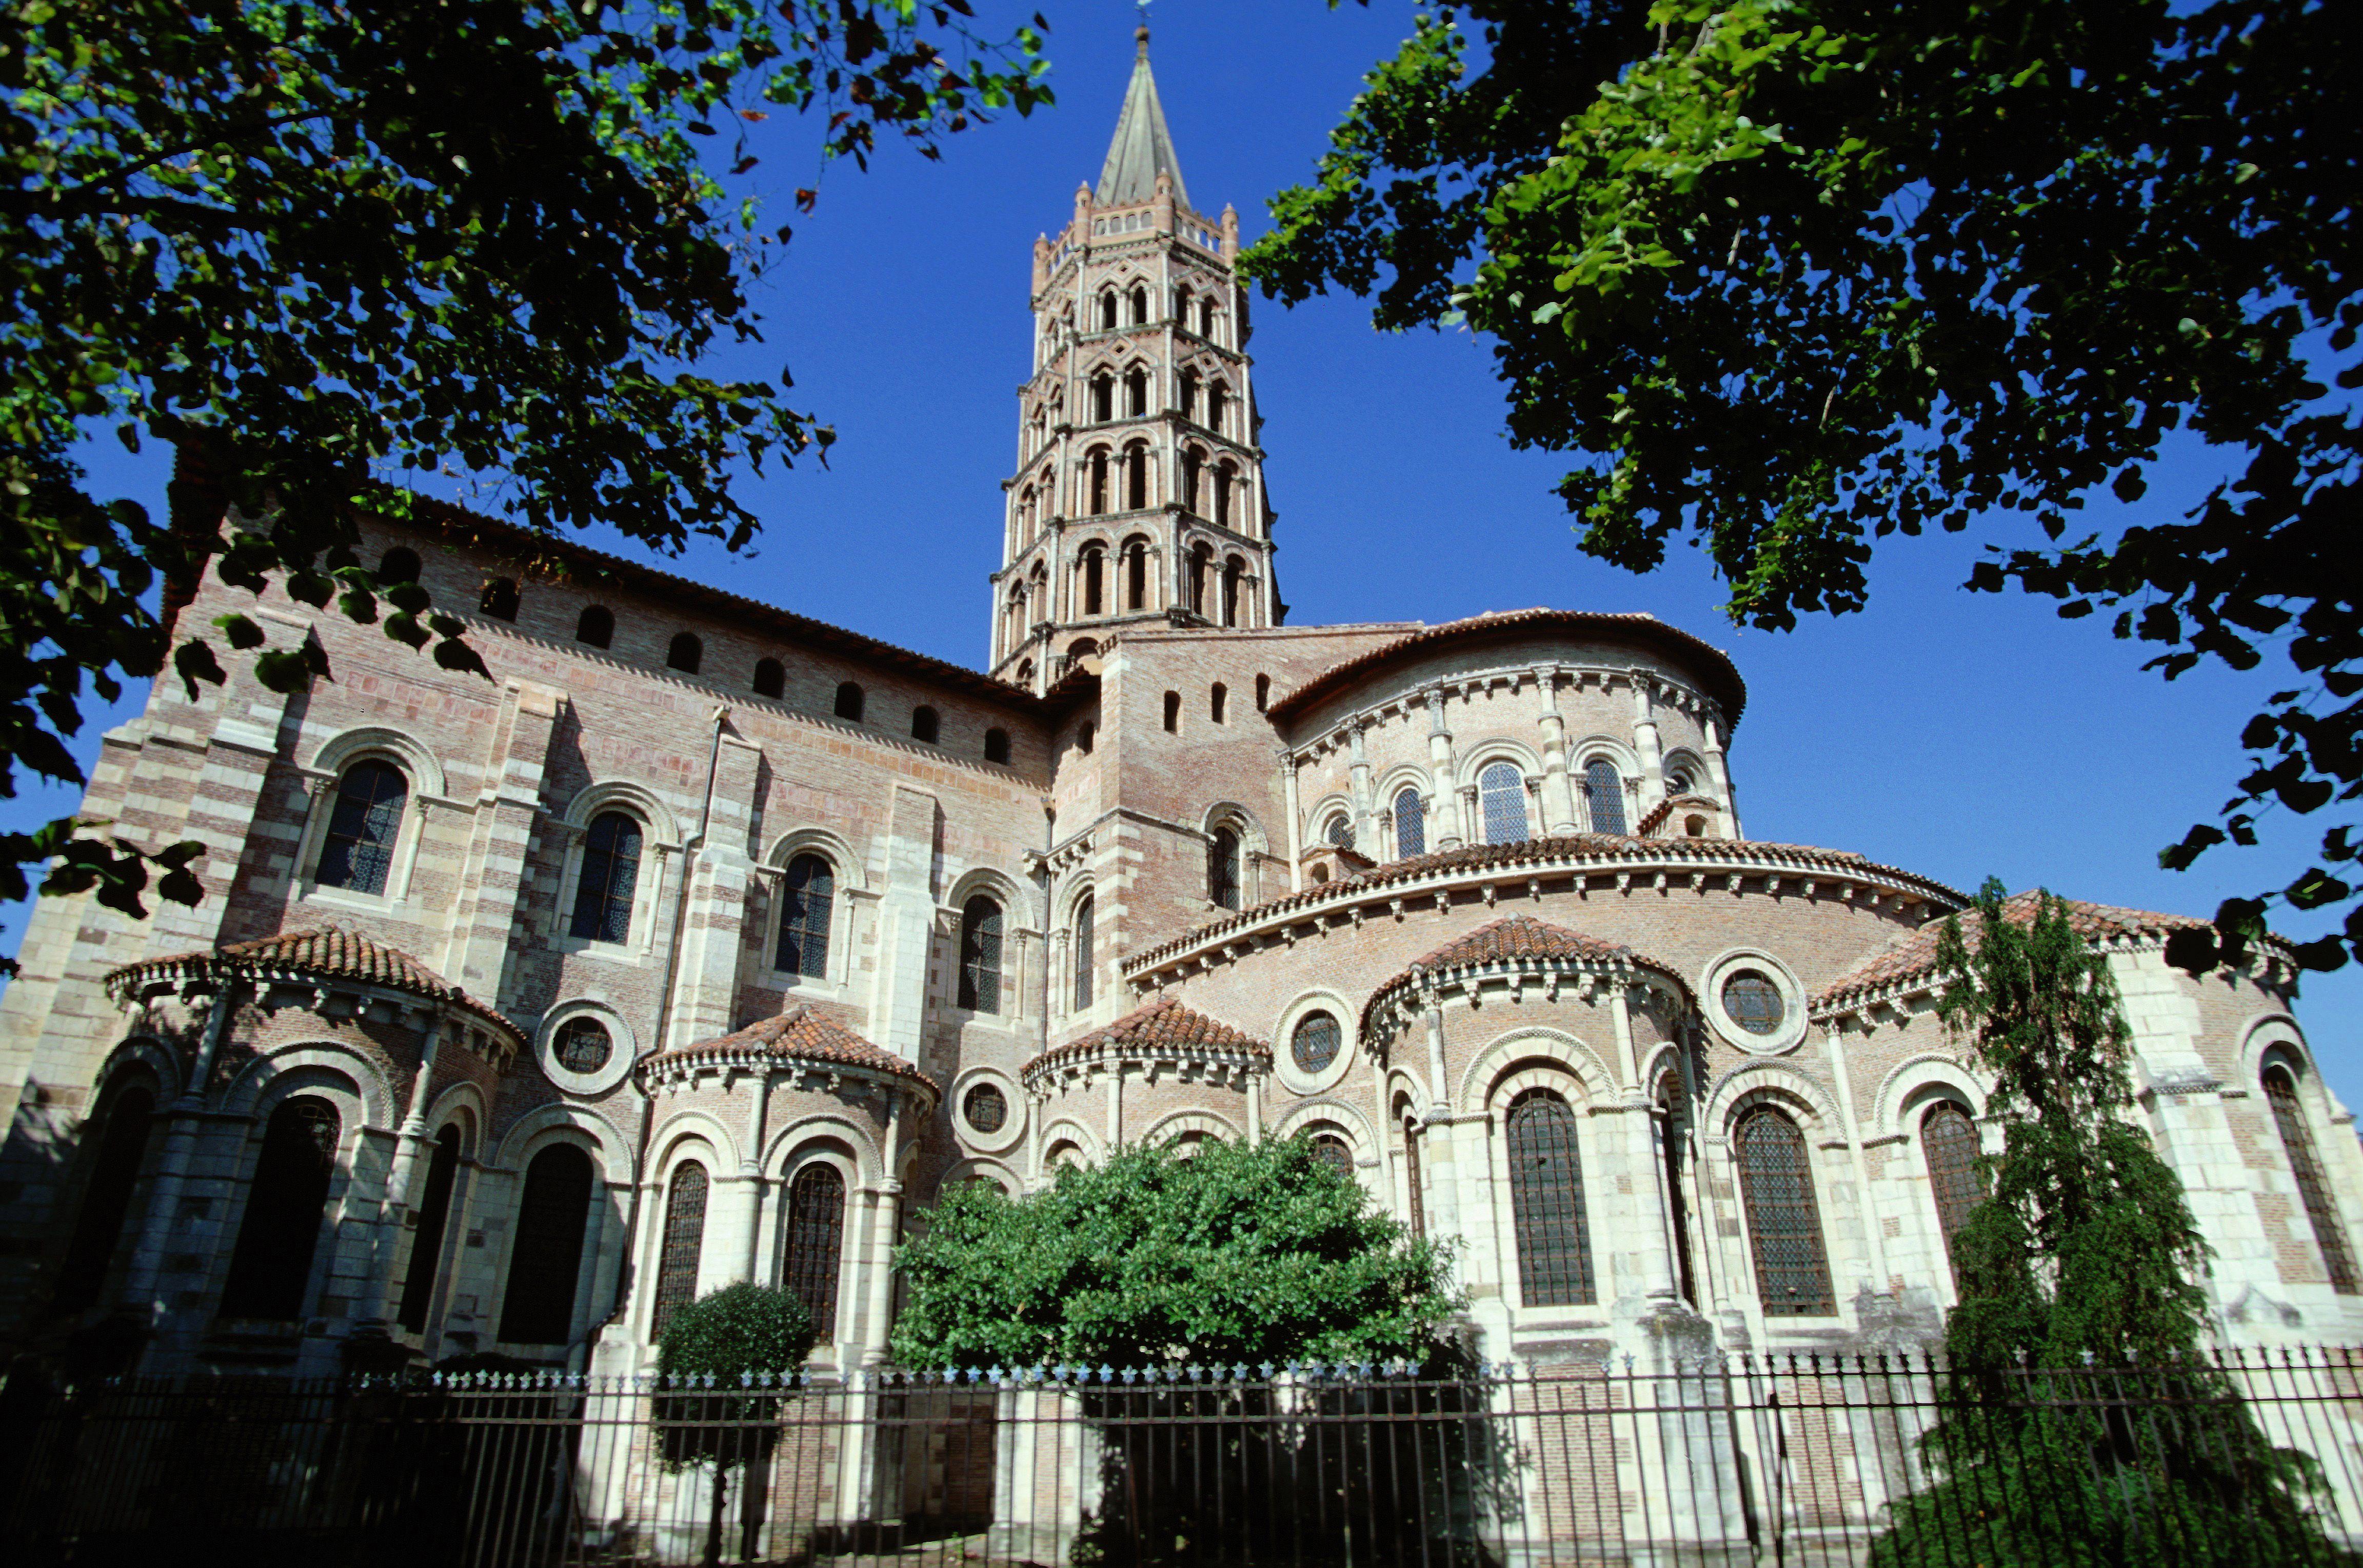 Basilica of St Sernin, Toulouse, France